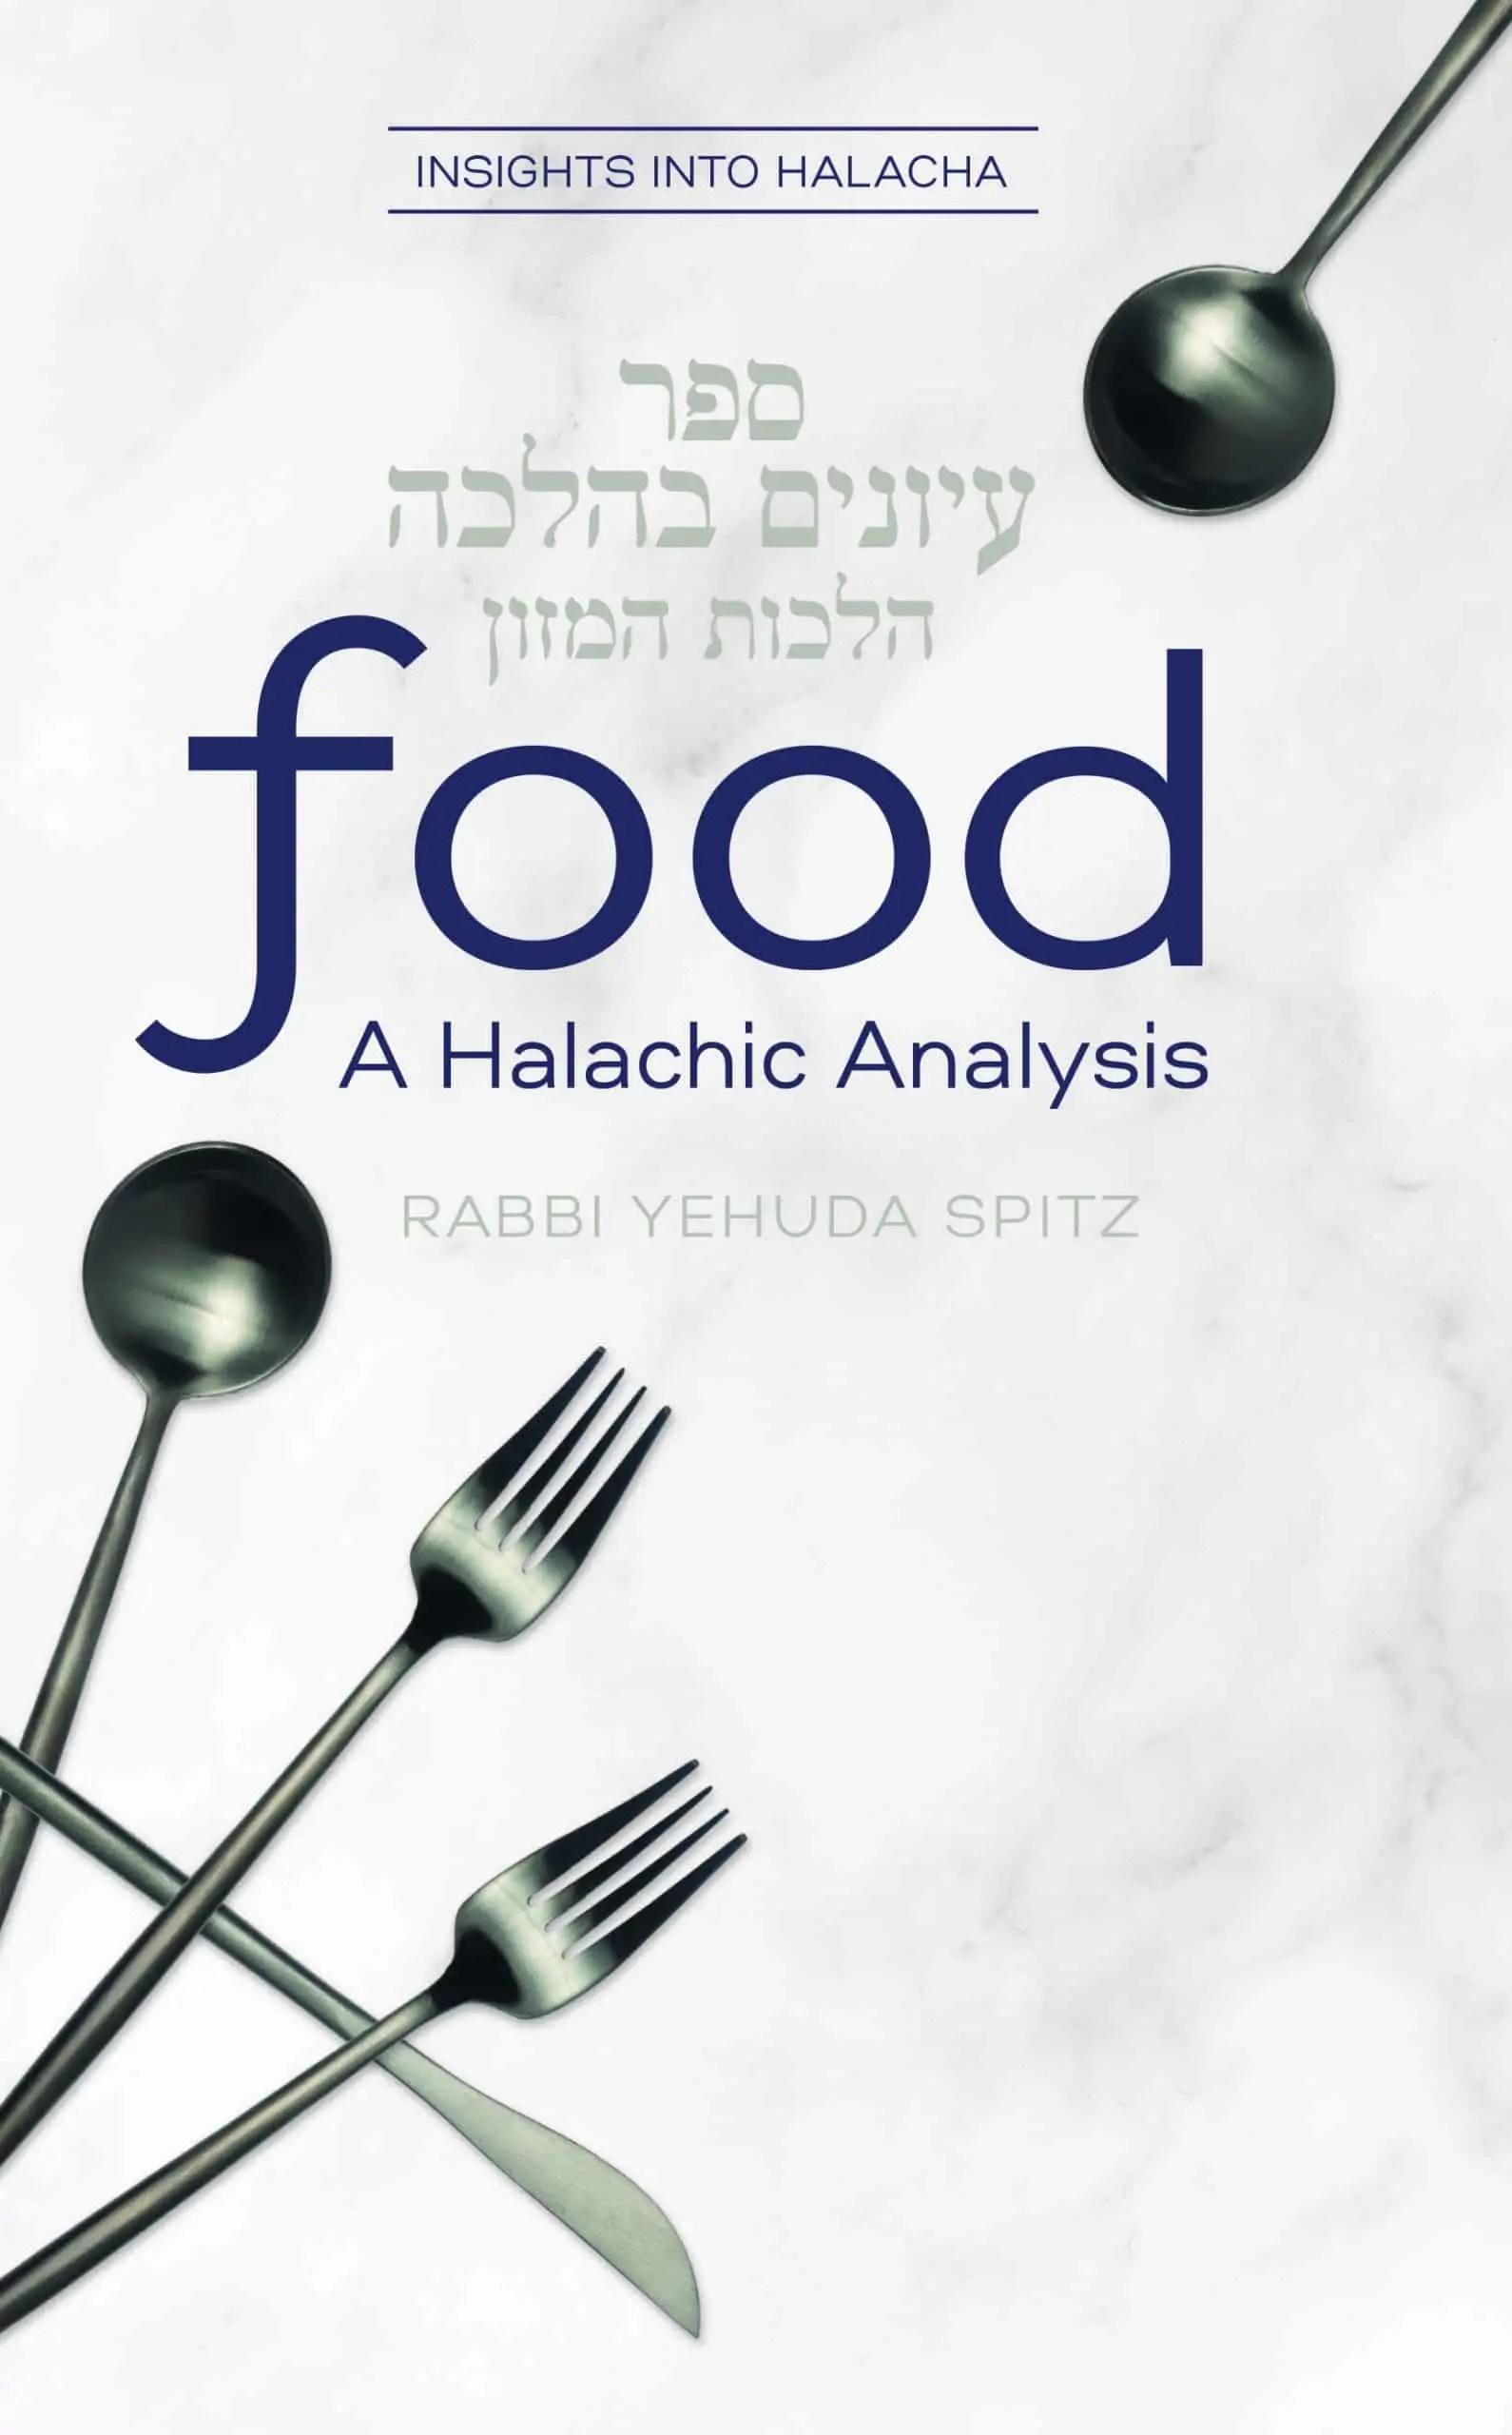 Rabbi Yehuda Spitz